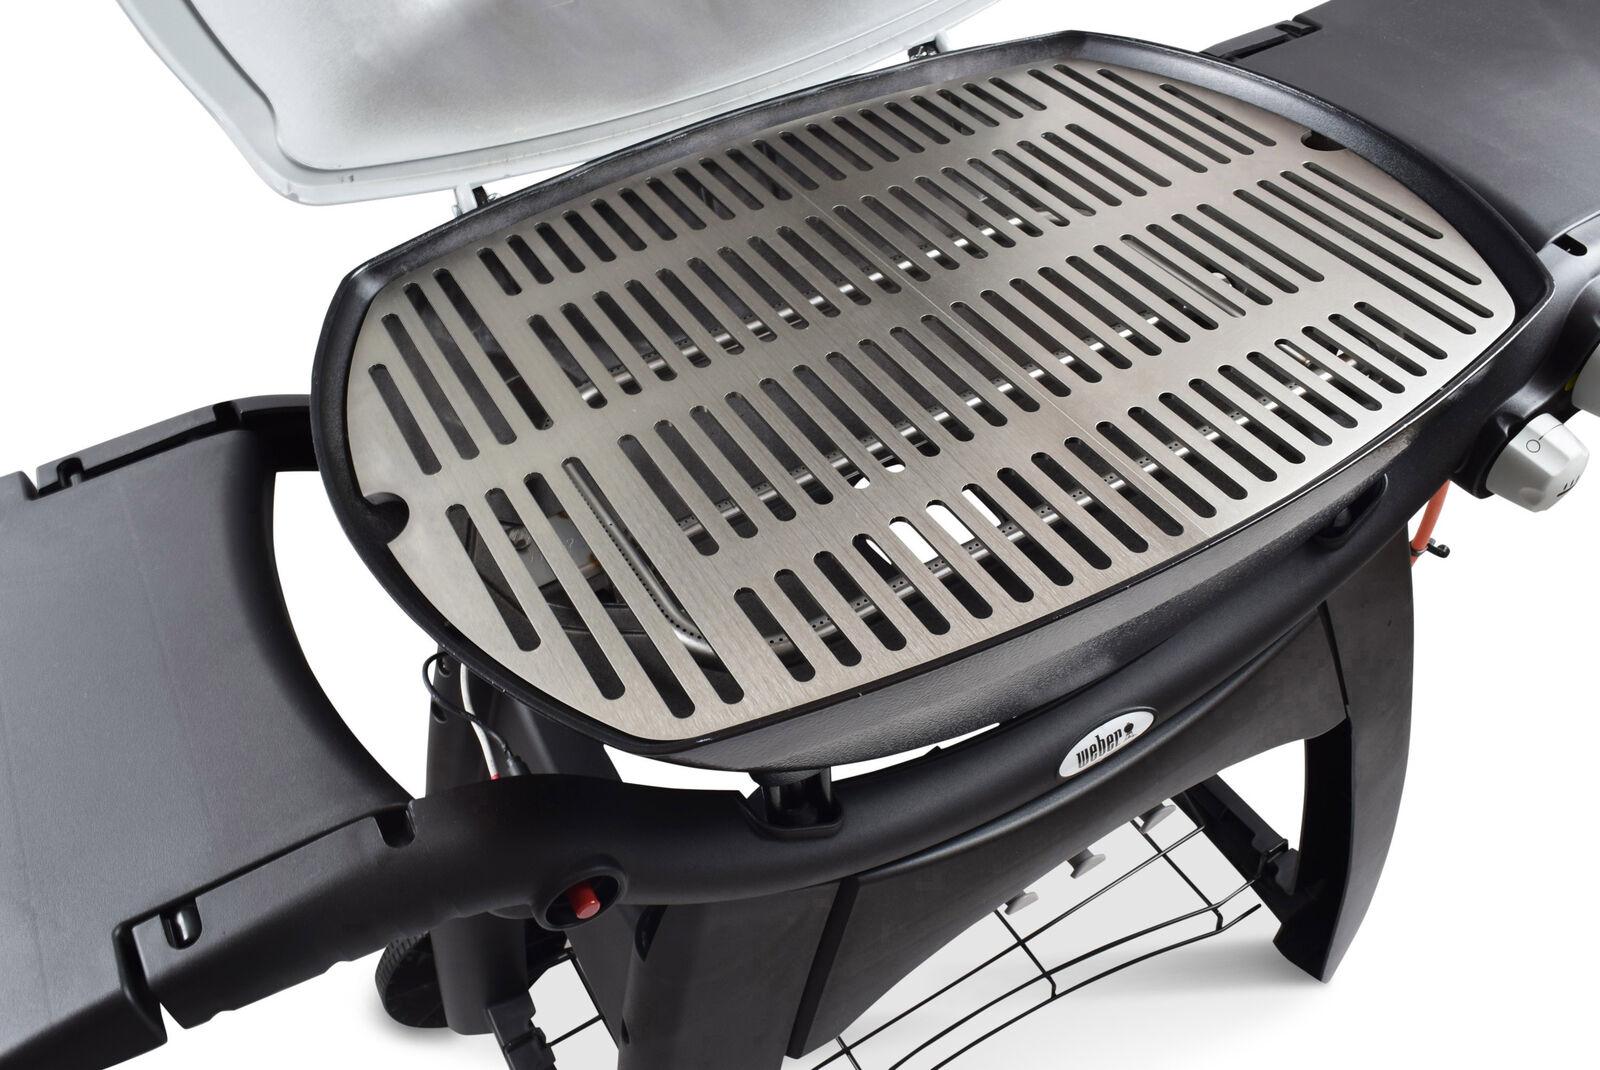 Weber Elektrogrill Q Test : Weber grill platte test vergleich weber grill platte günstig